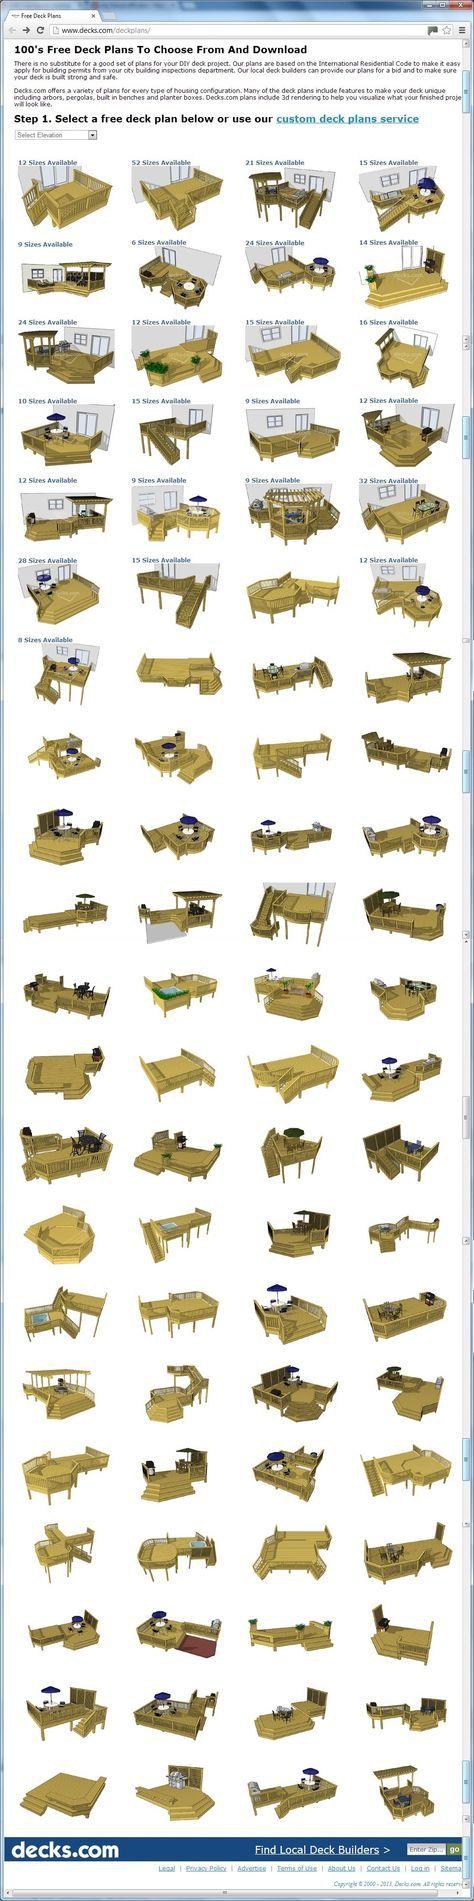 Best 25+ Deck Building Plans Ideas On Pinterest  Deck Design, Wood Deck  Designs And Decks